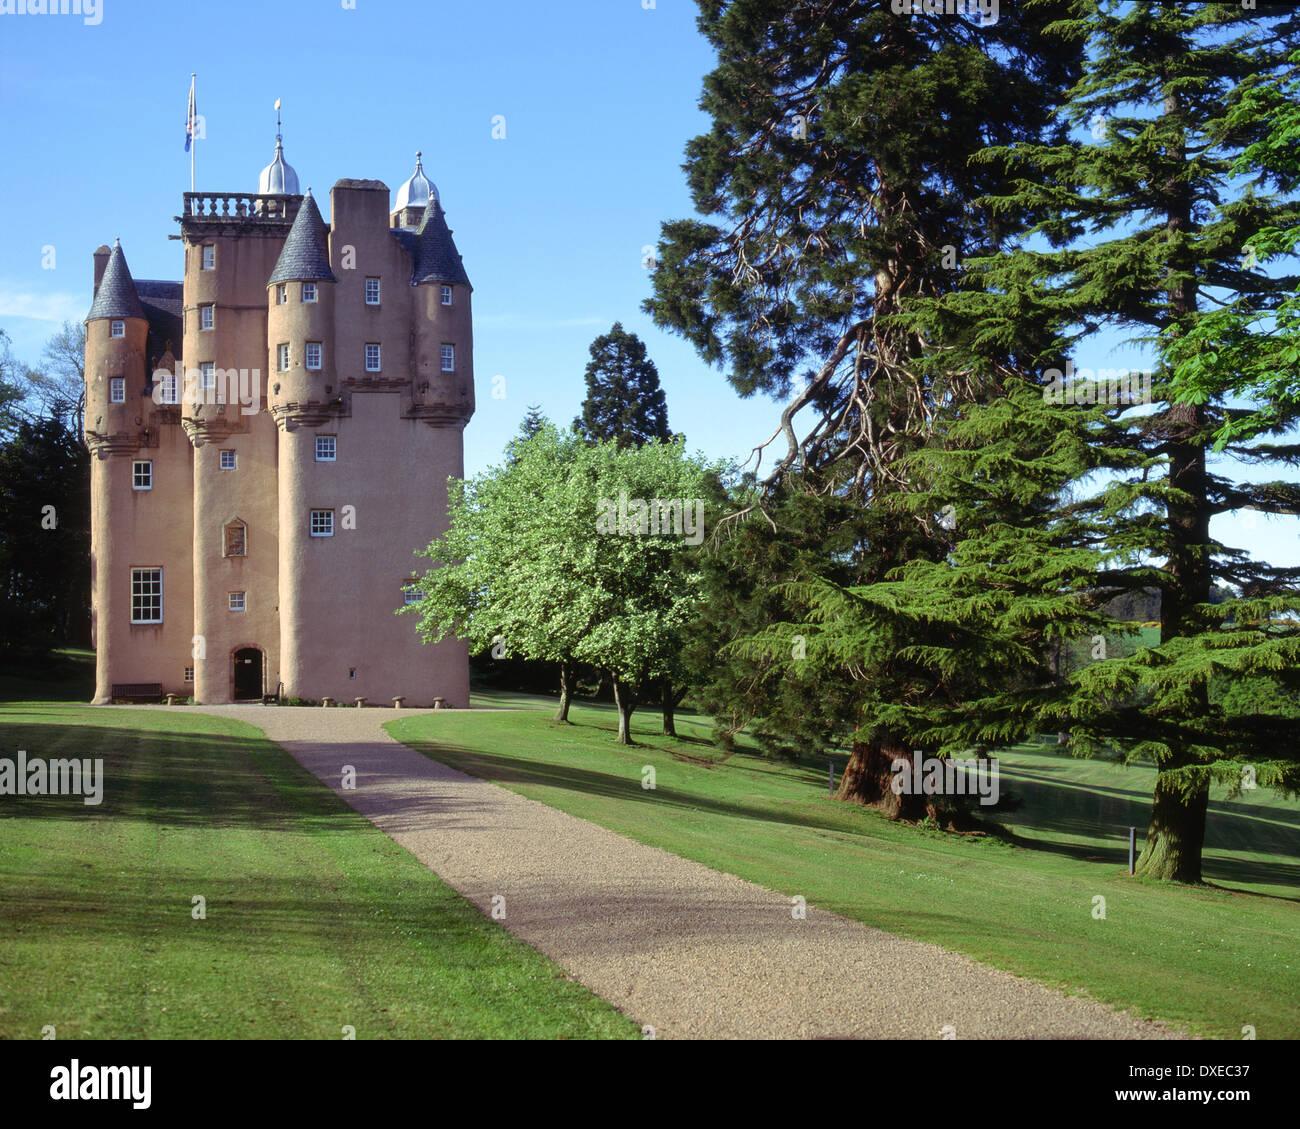 Craigivar Castle, An L Plan Tower House (1626) Nr Alford, Aberdeenshire